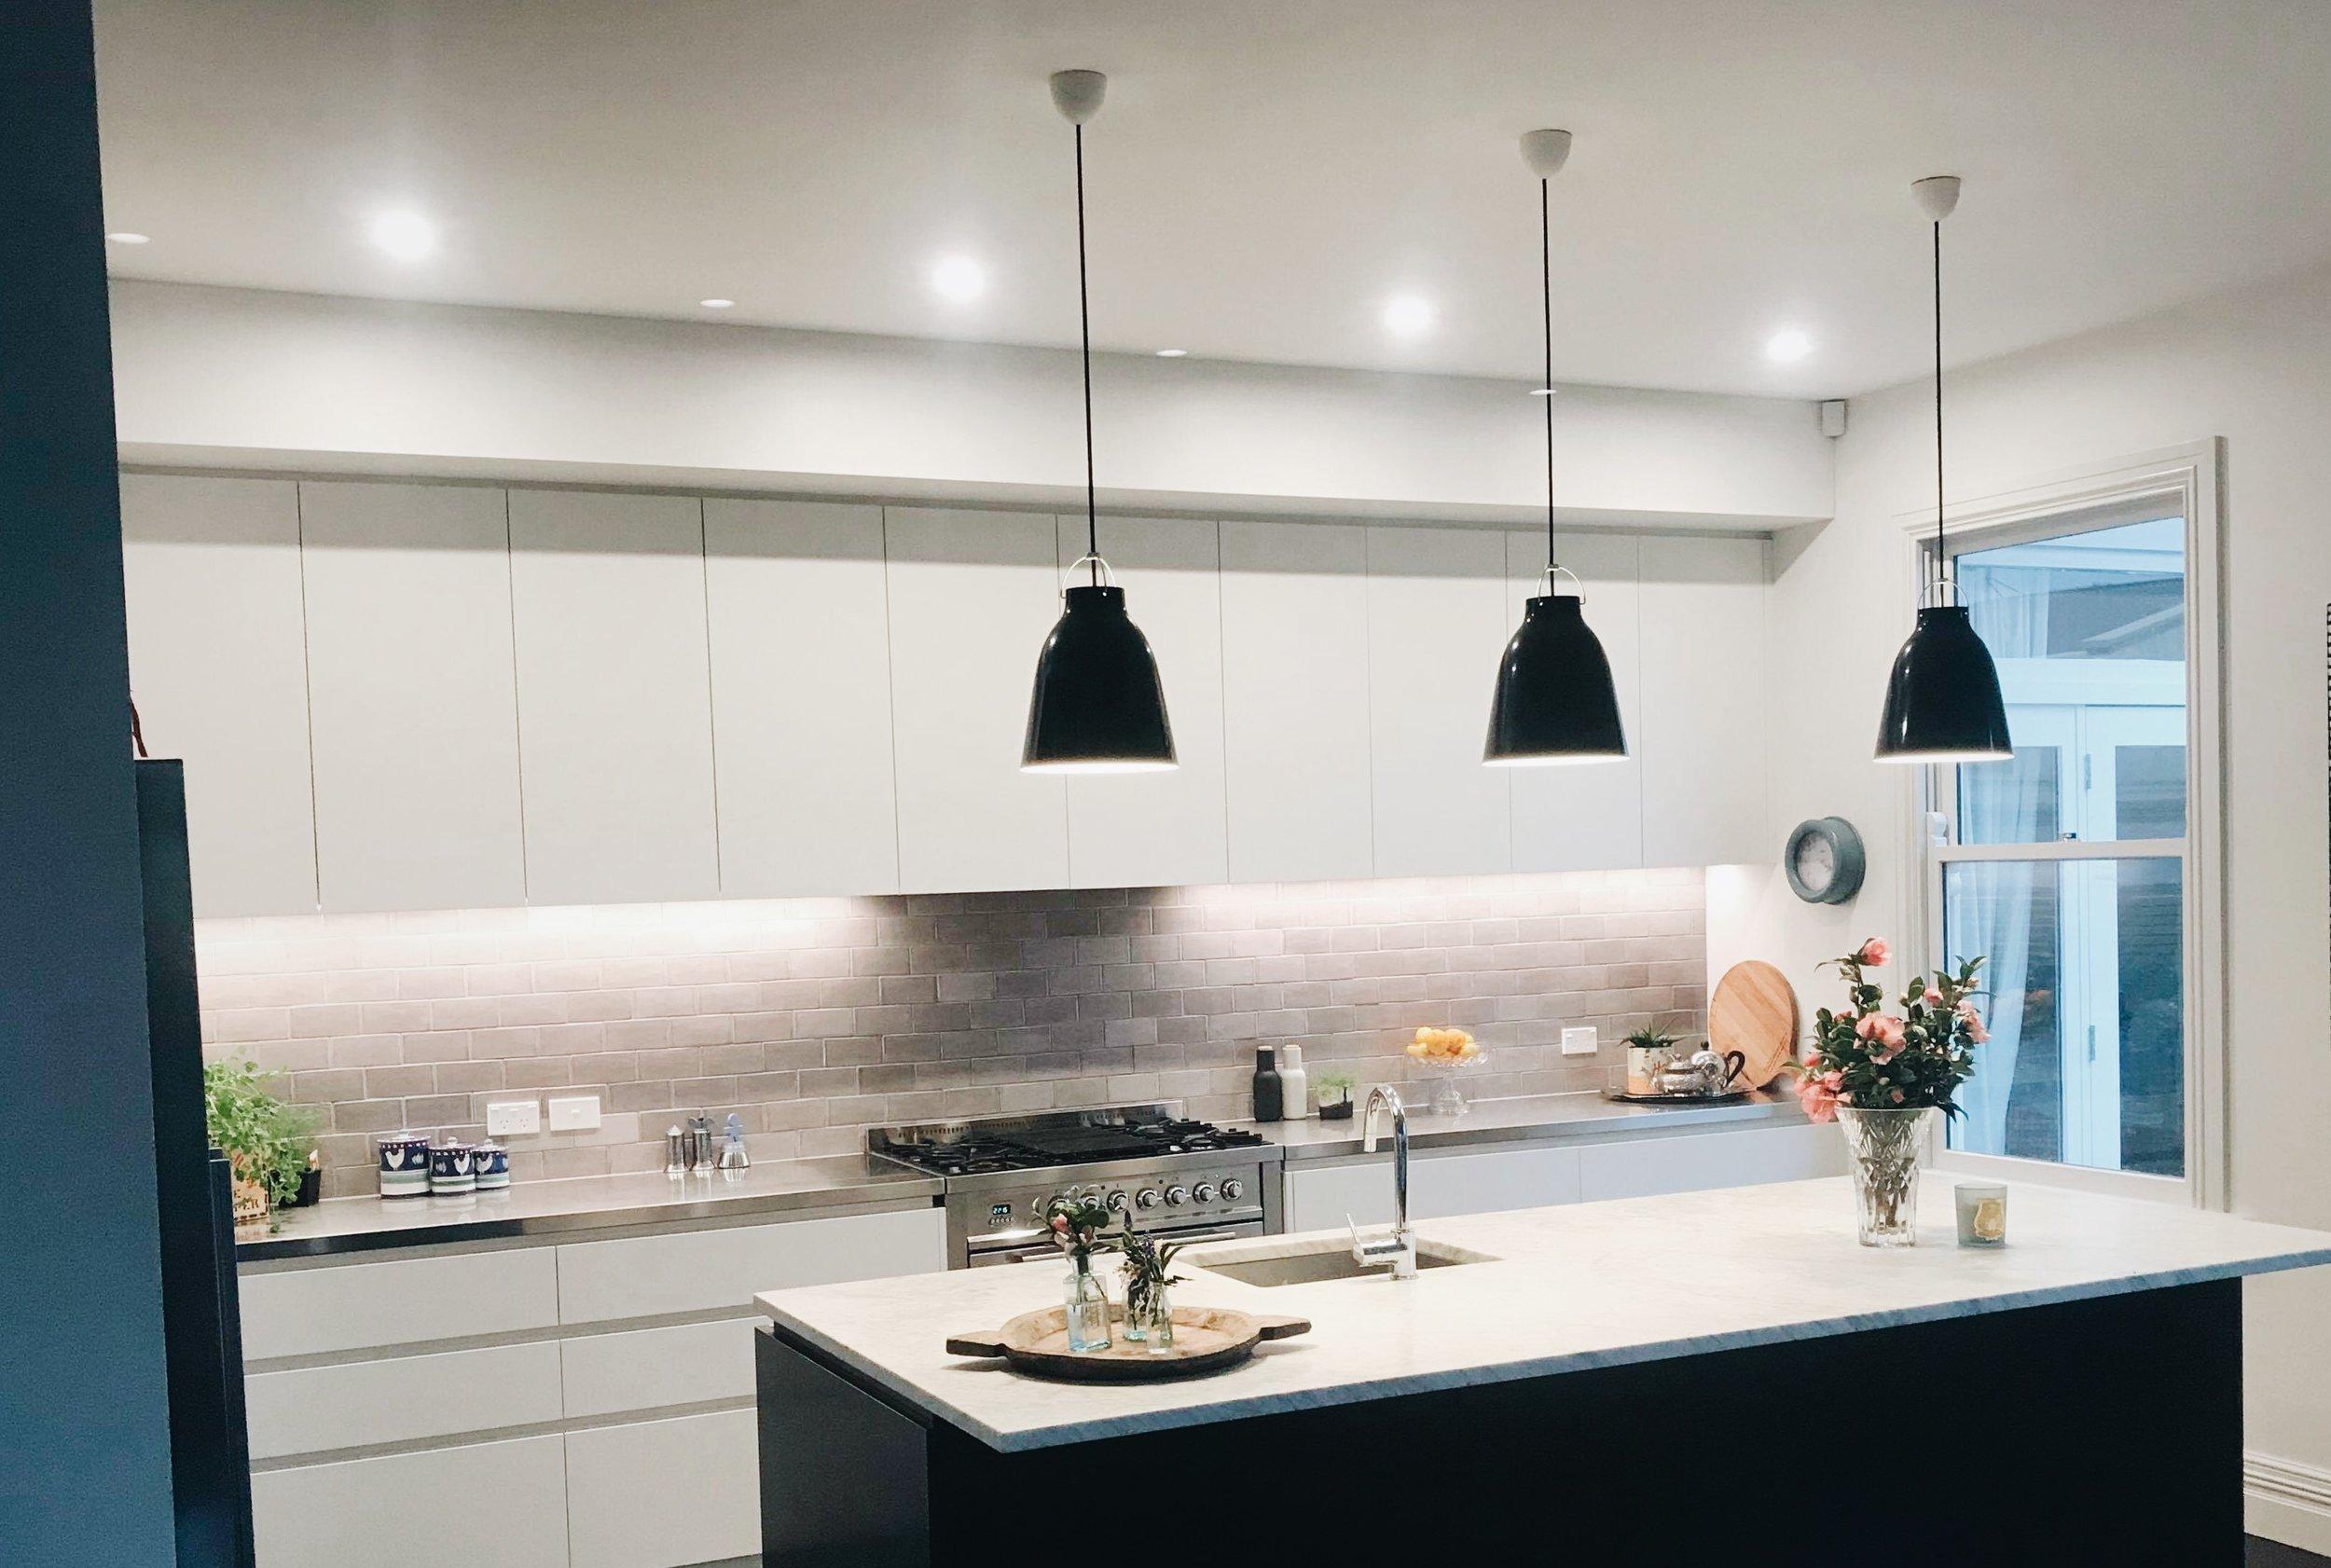 Khandallah Residential Kitchen.